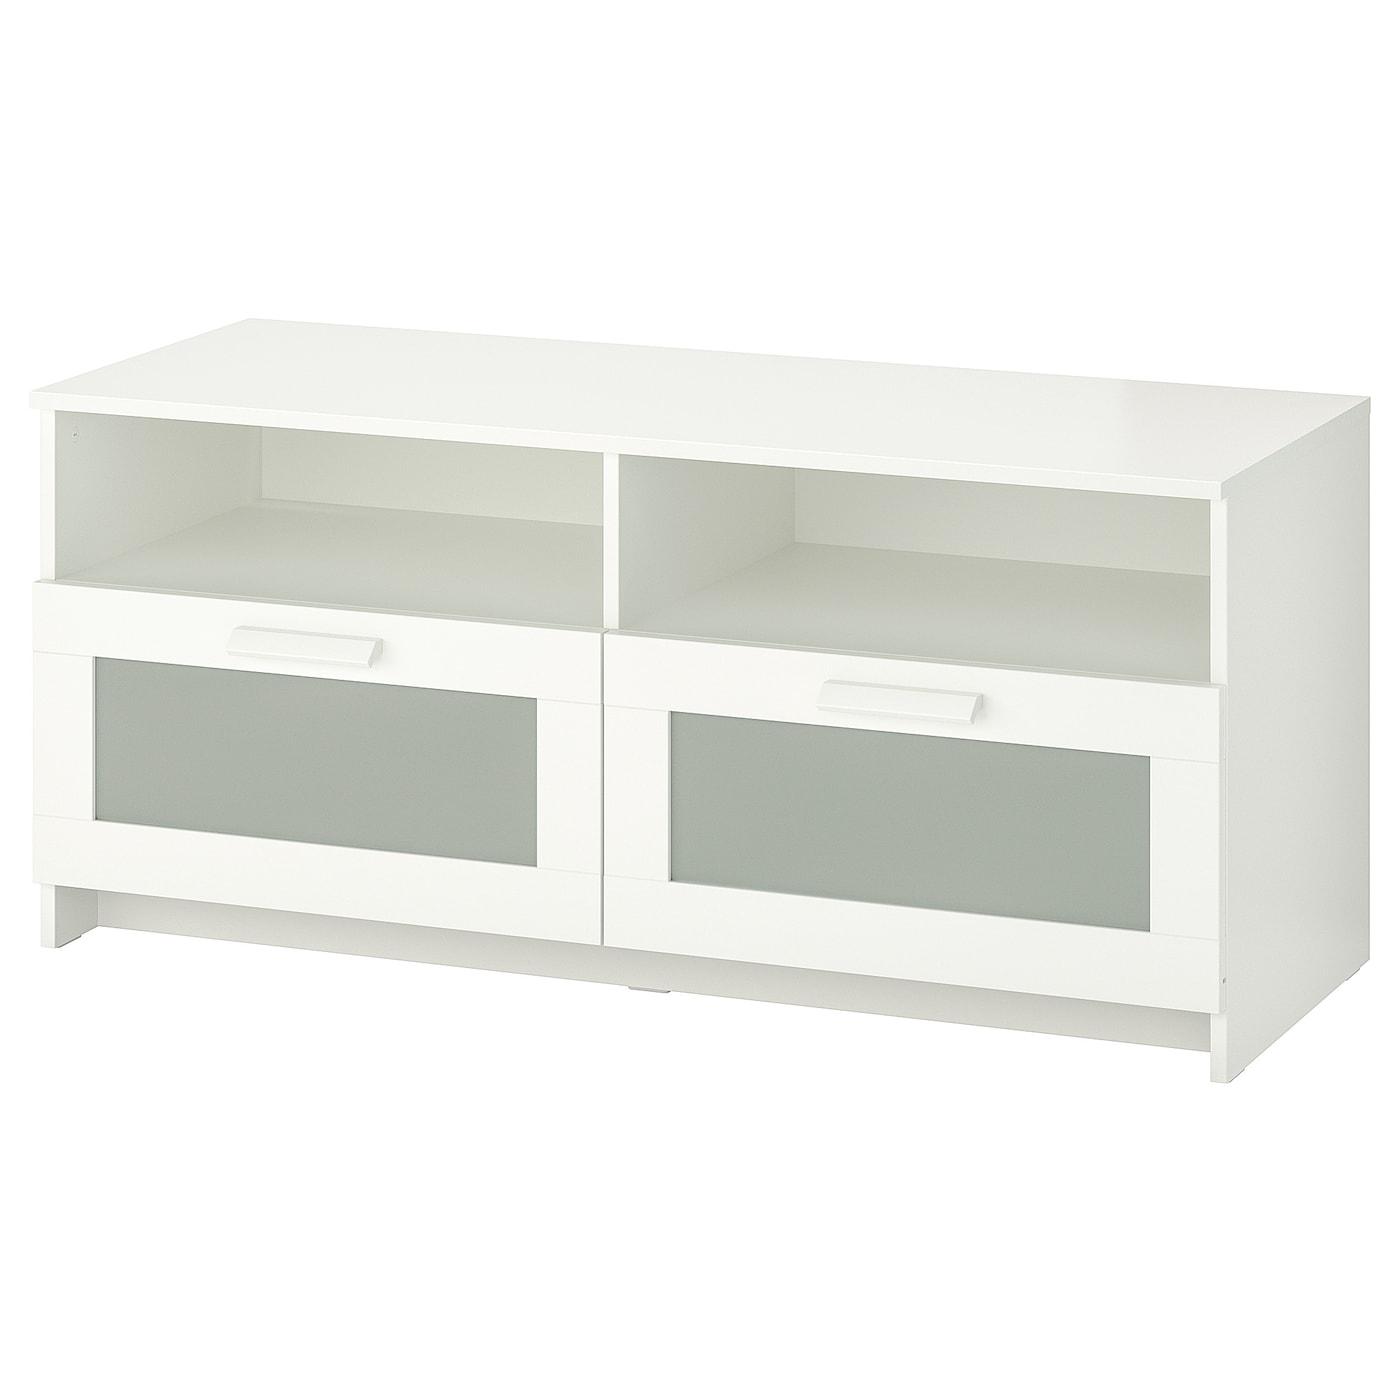 Brimnes Tv Unit White 47 1 4x16